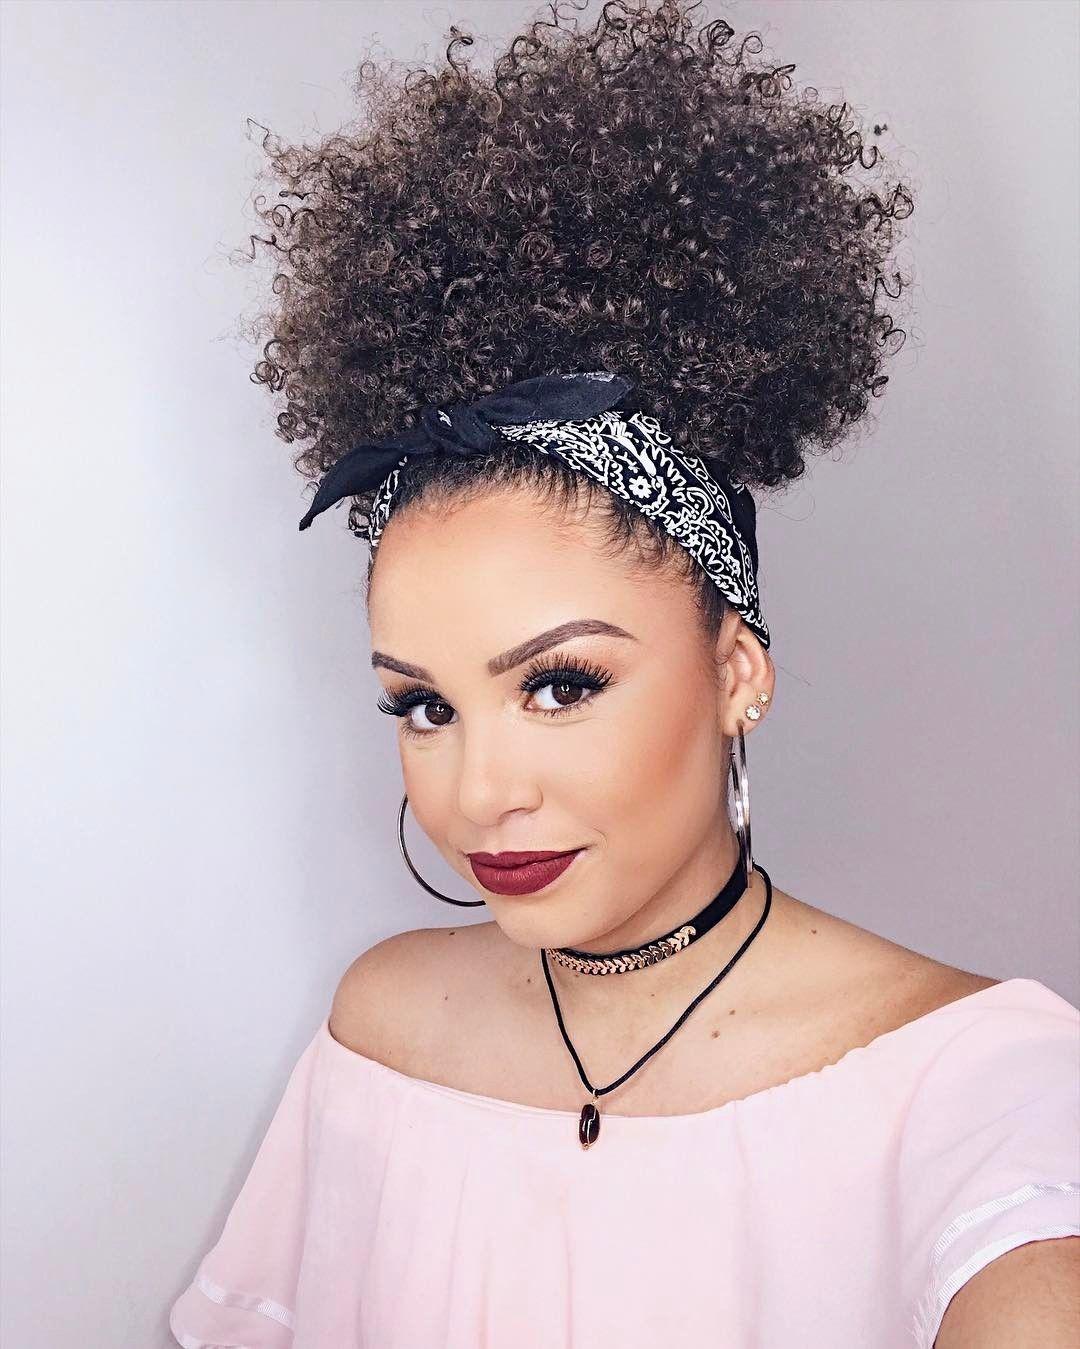 Ana cabello instagram